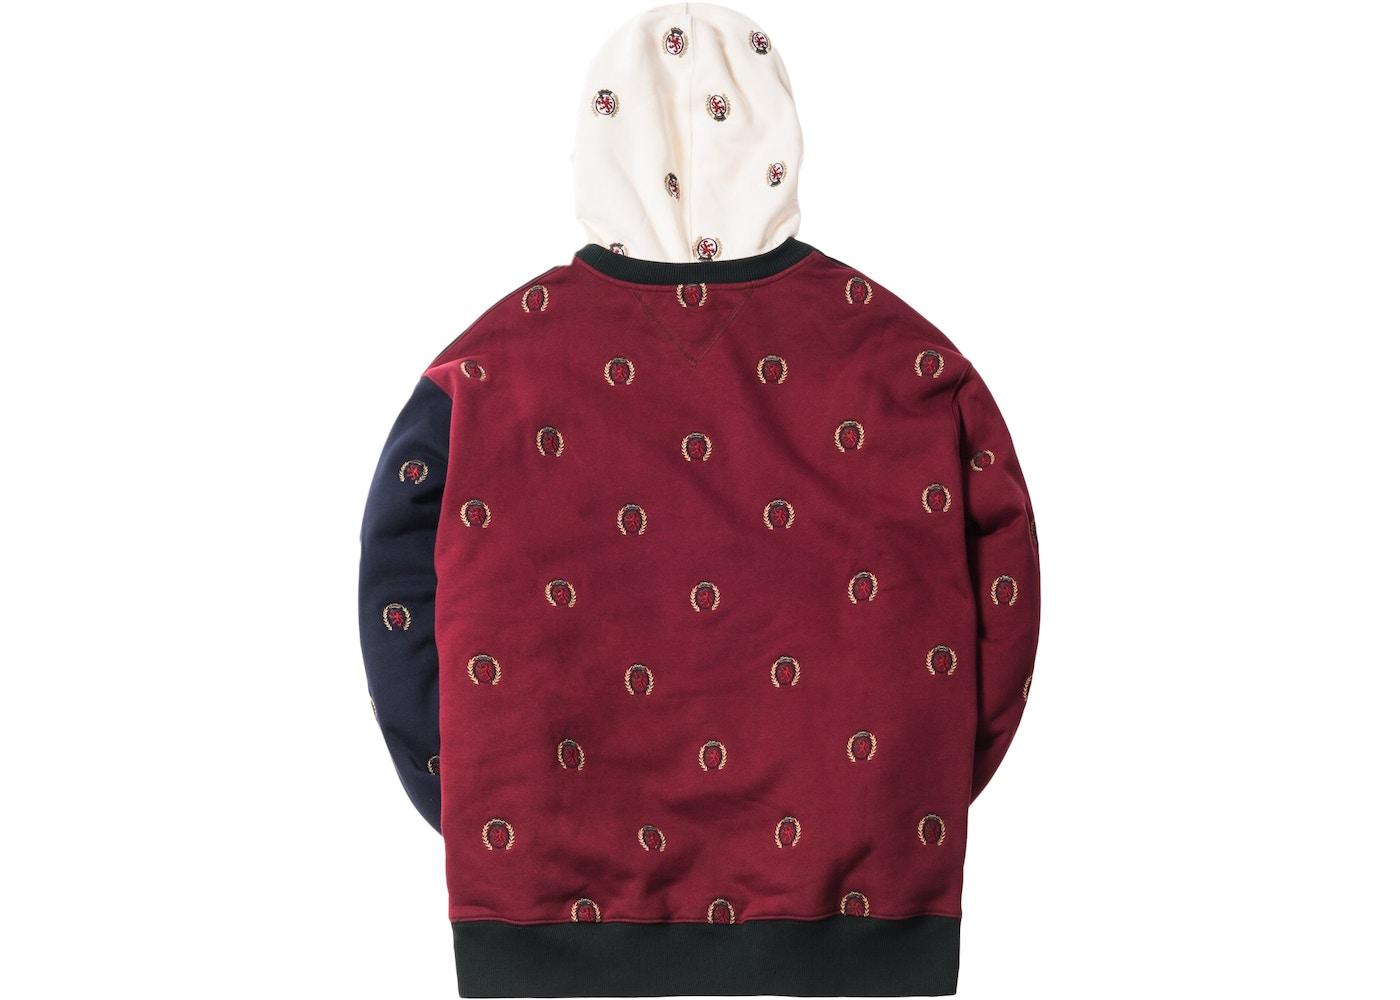 b9e6c21454 Sell. or Ask. Size  XL. View All Bids. Kith x Tommy Hilfiger Full  Embroidered Crest ...